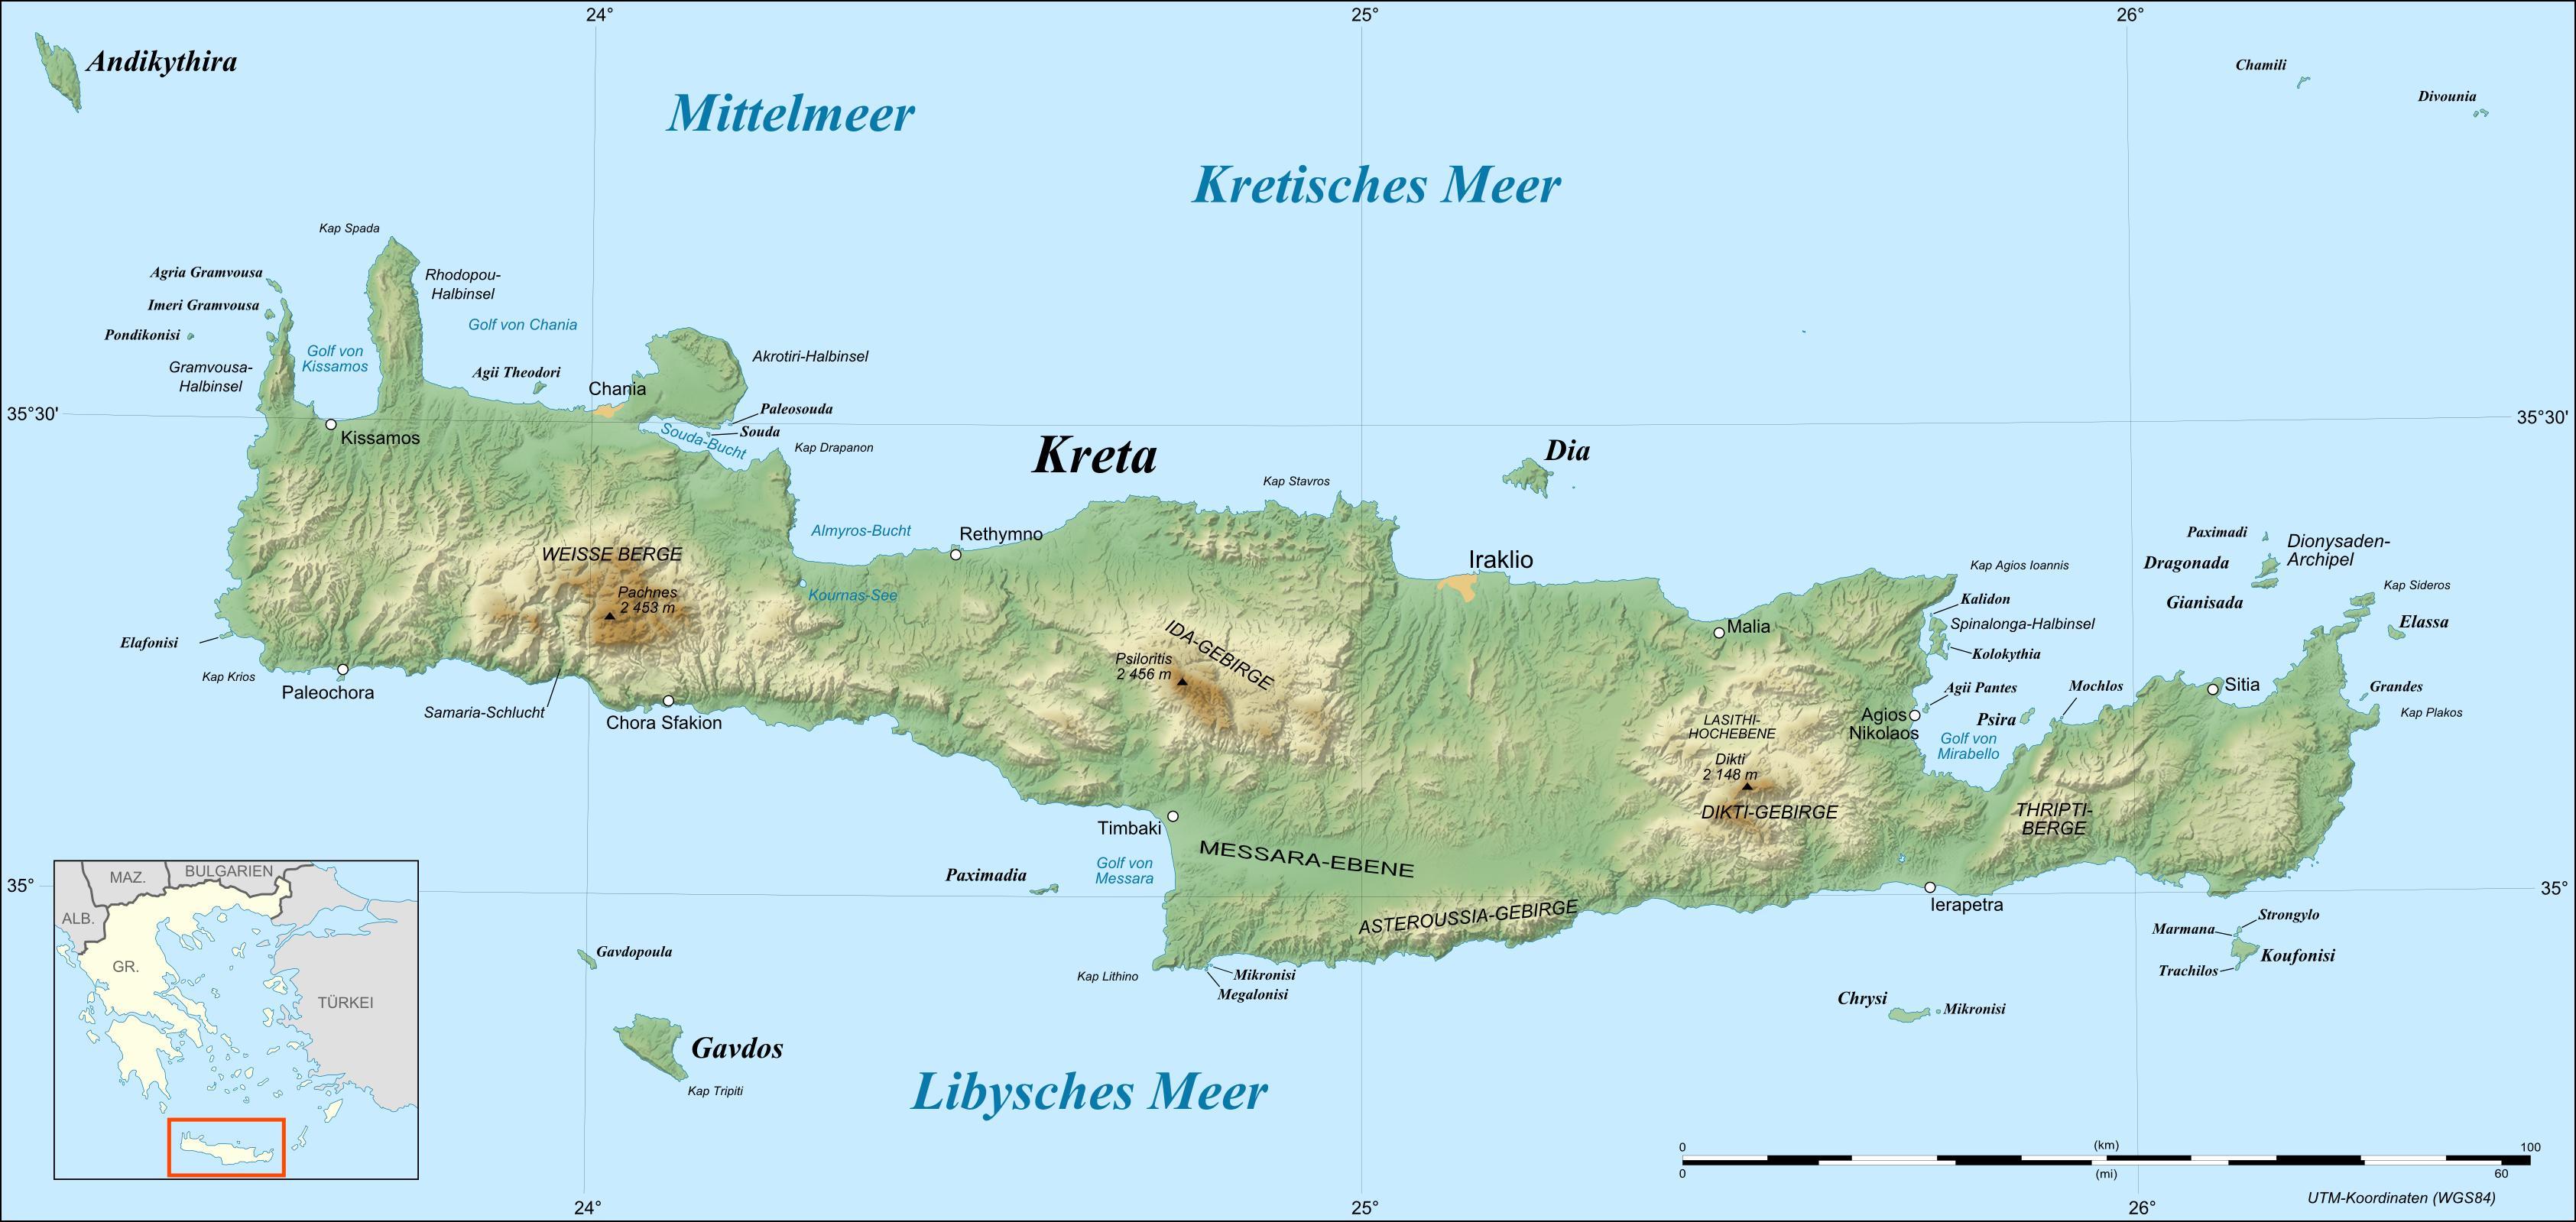 kreta weltkarte Landkarte Kreta (Reliefkarte) : Weltkarte.  Karten und  kreta weltkarte